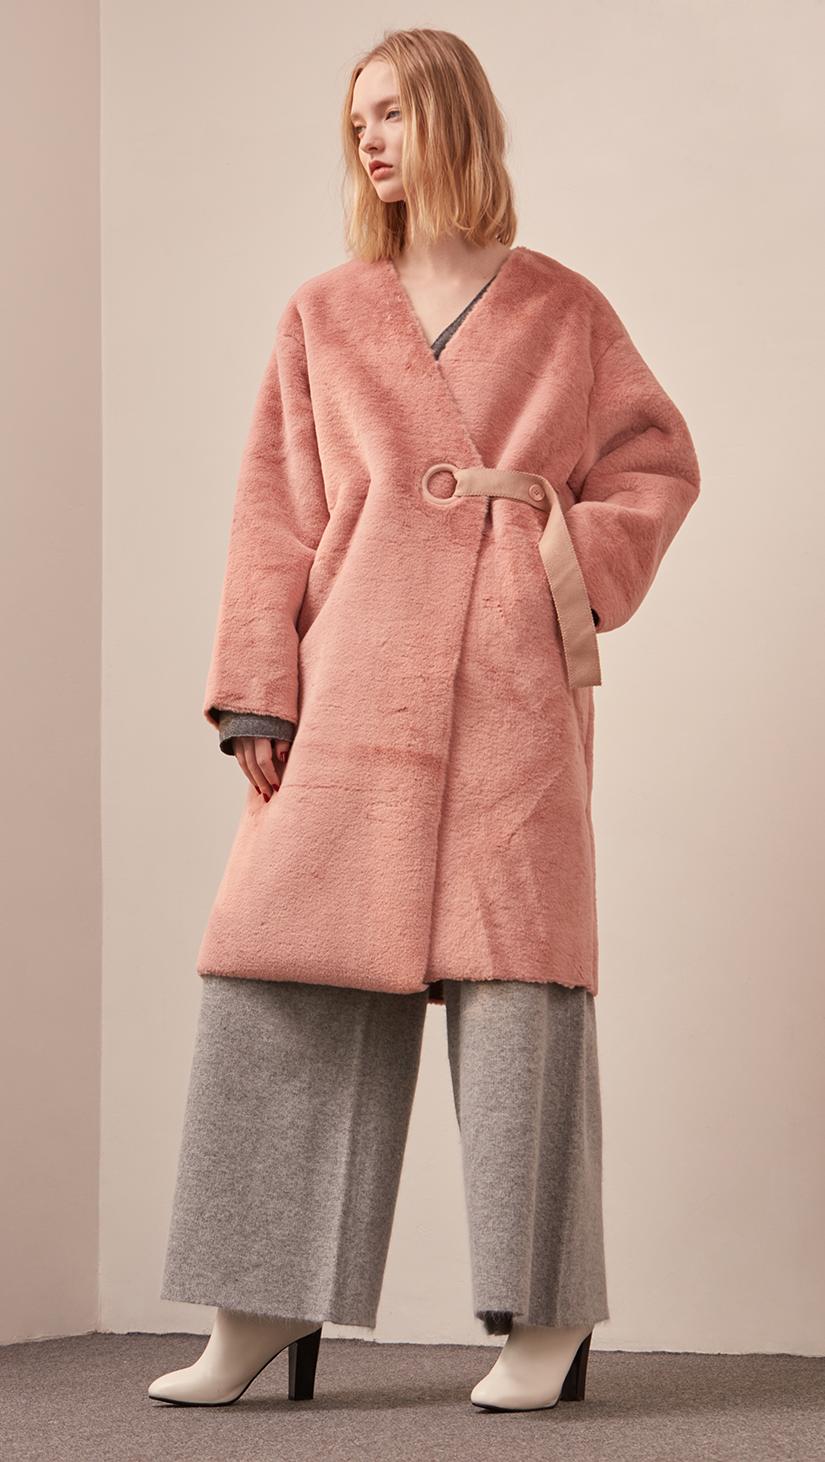 Valenxina Coat   2018SS   Pinterest   コート、ファッション、ジャケット コート